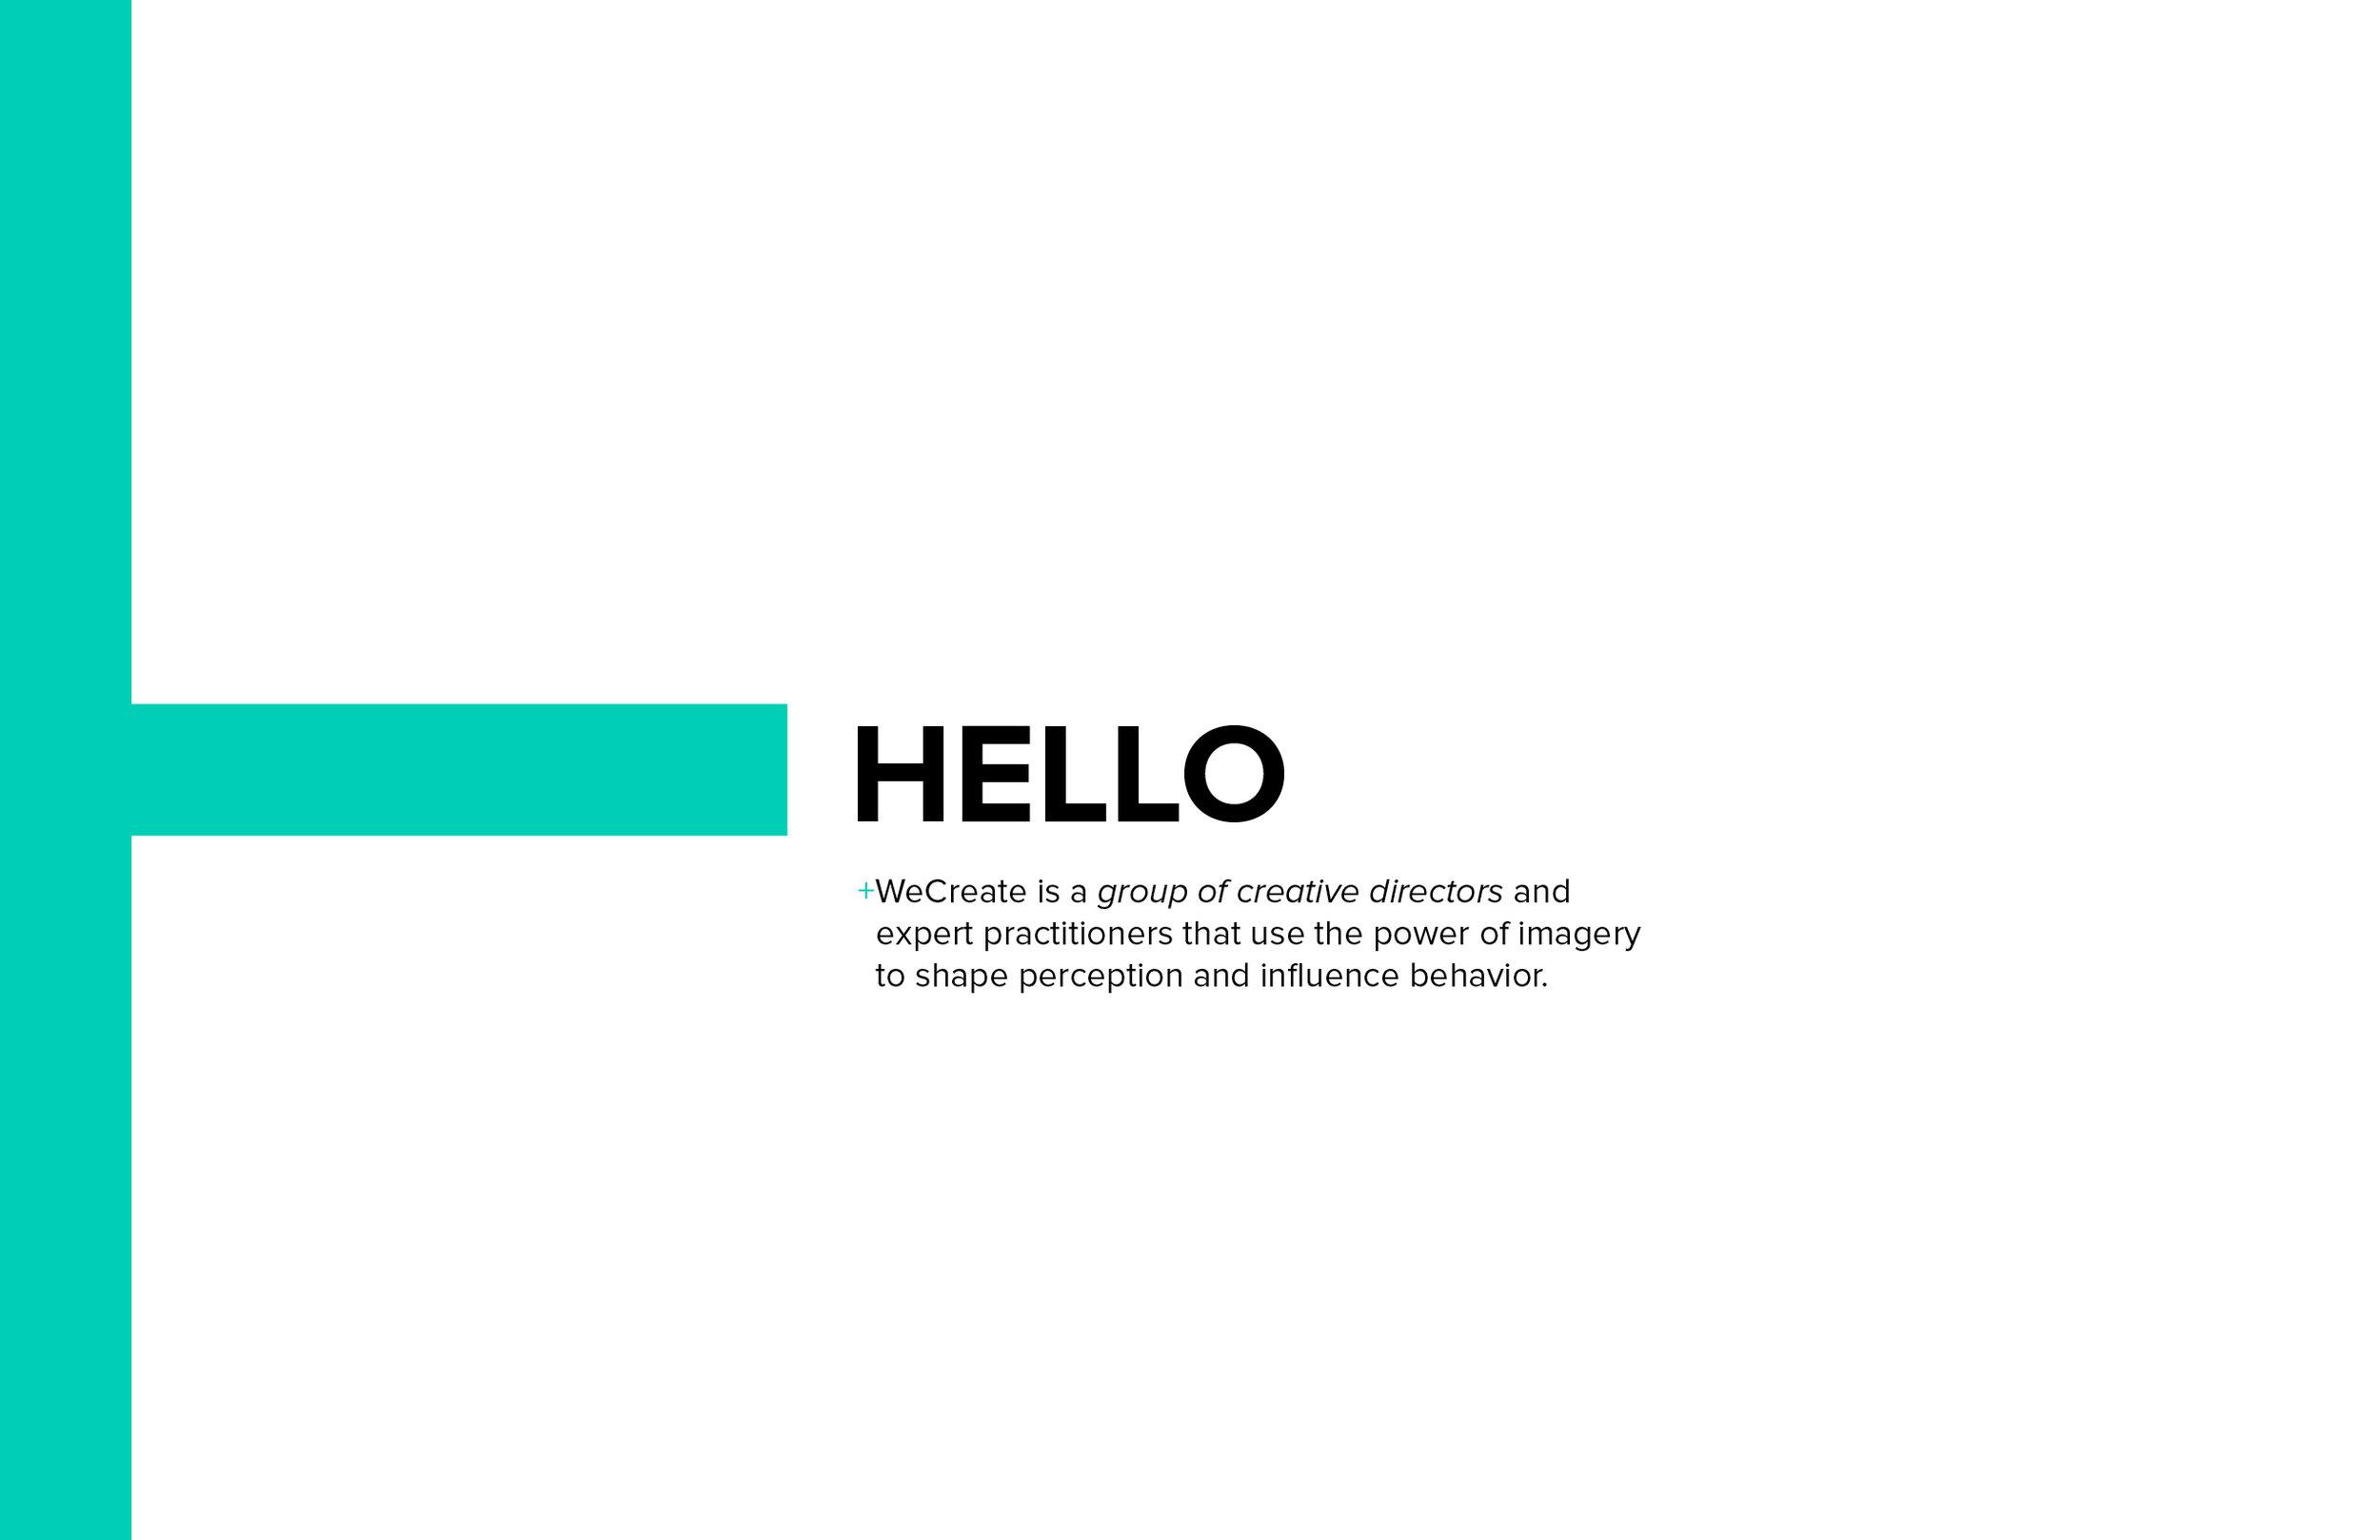 WeCreate-Hosp Division2.jpg